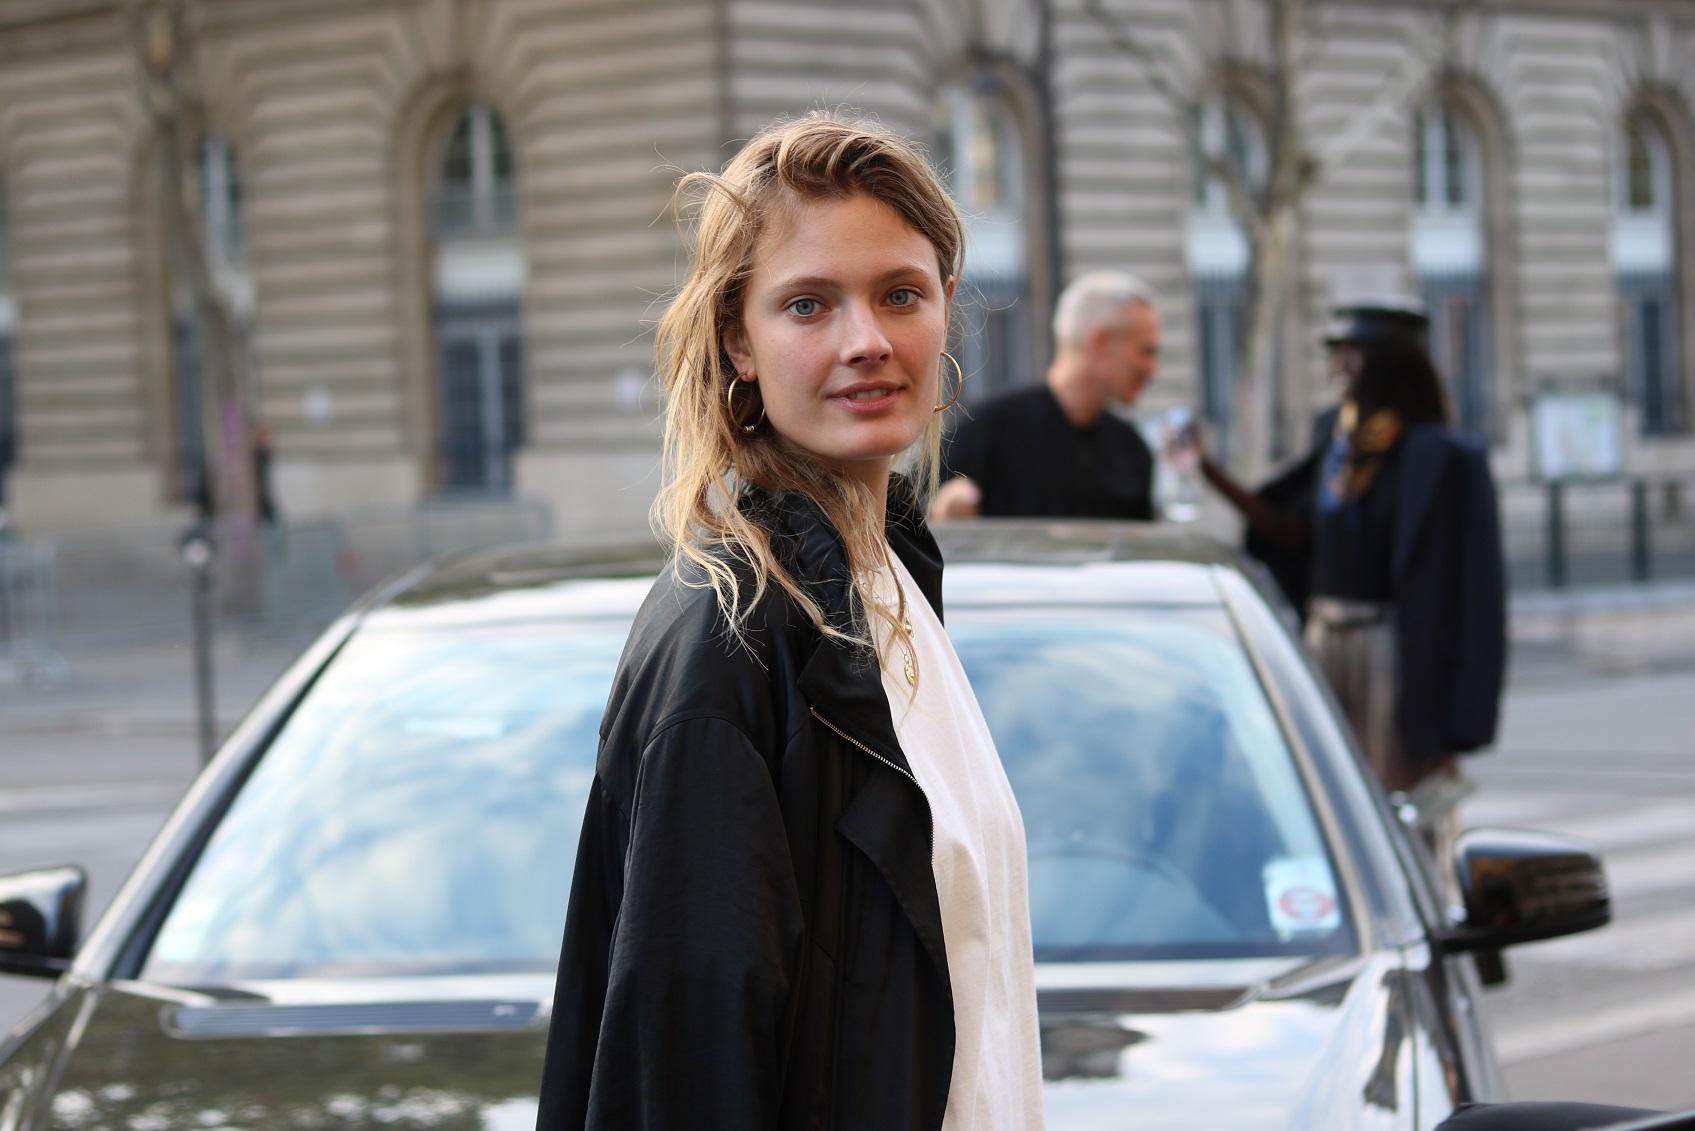 buy sale 100% top quality best quality Constance Jablonski before Balmain S/S 19 – THE MODEL SPOTTER